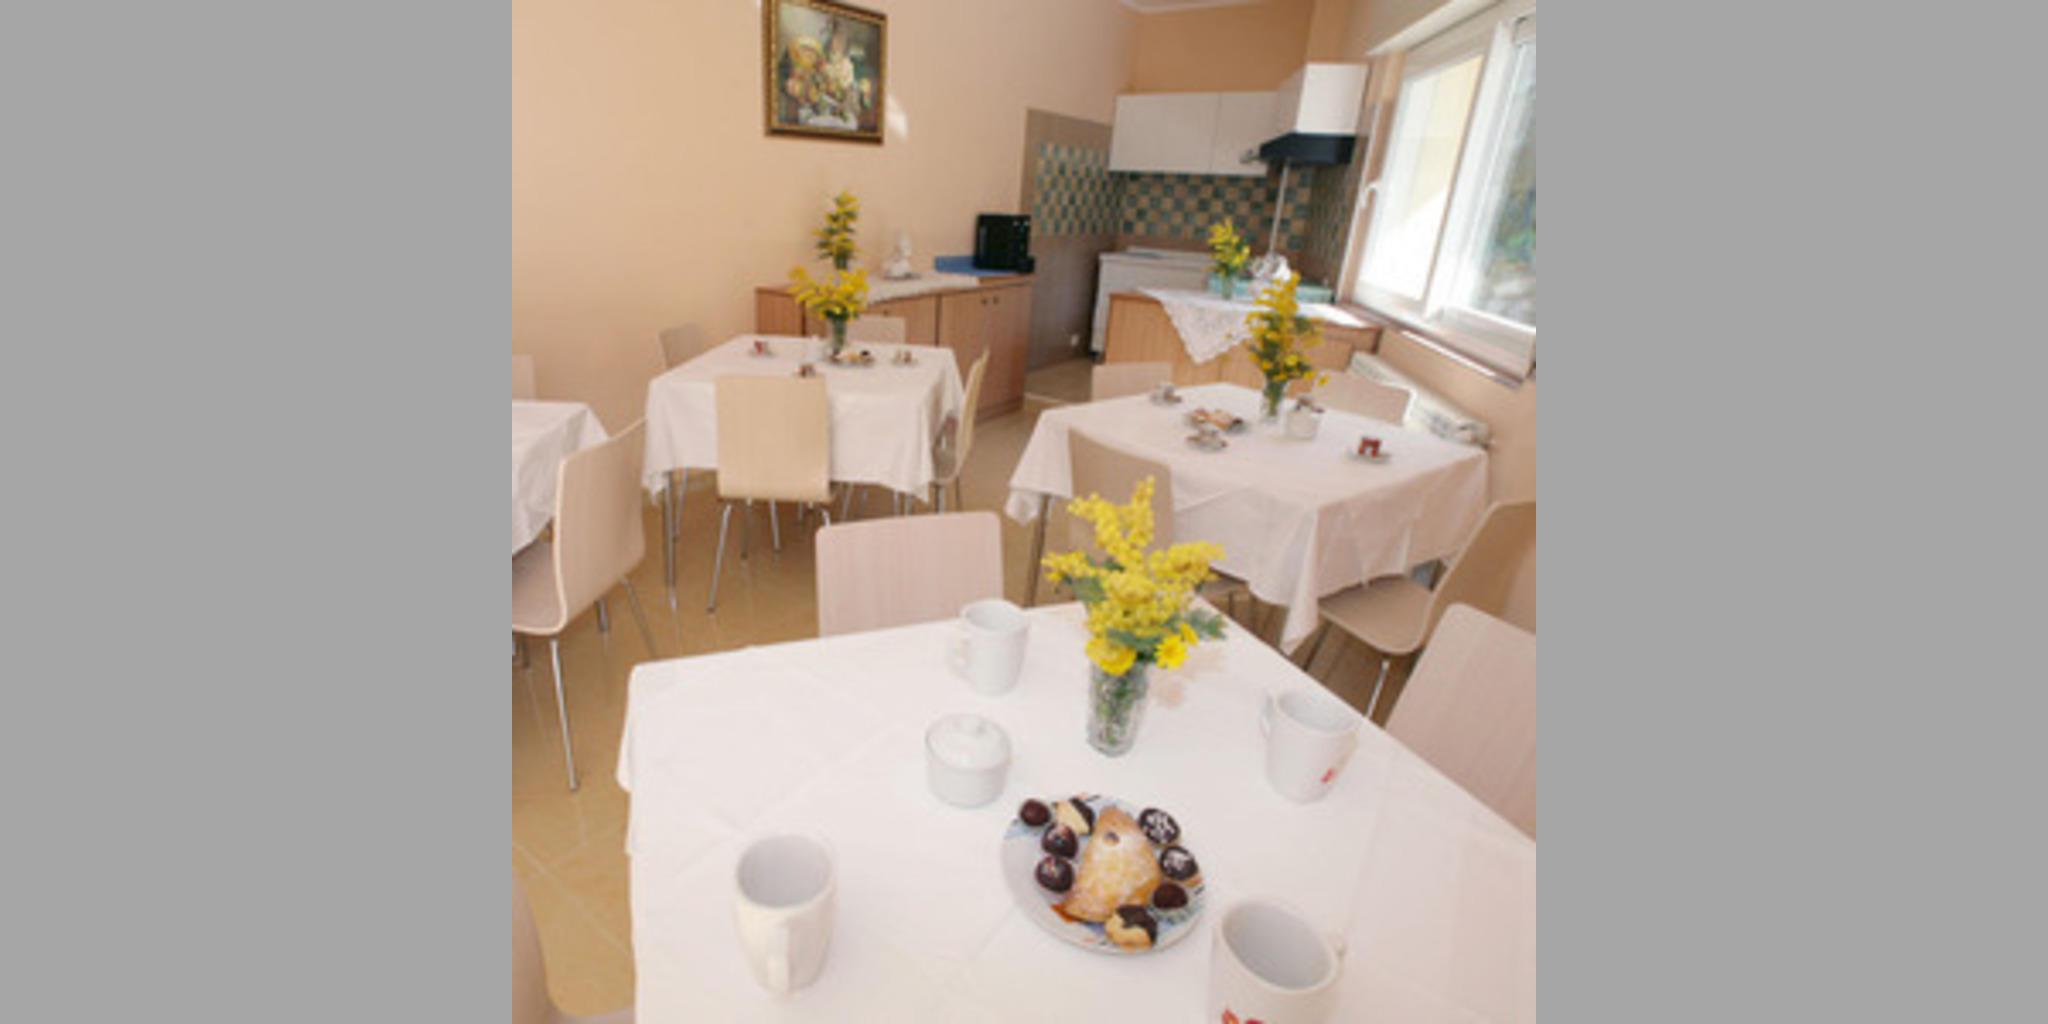 Bed & Breakfast San Michele Di Ganzaria - Caltagirone_A